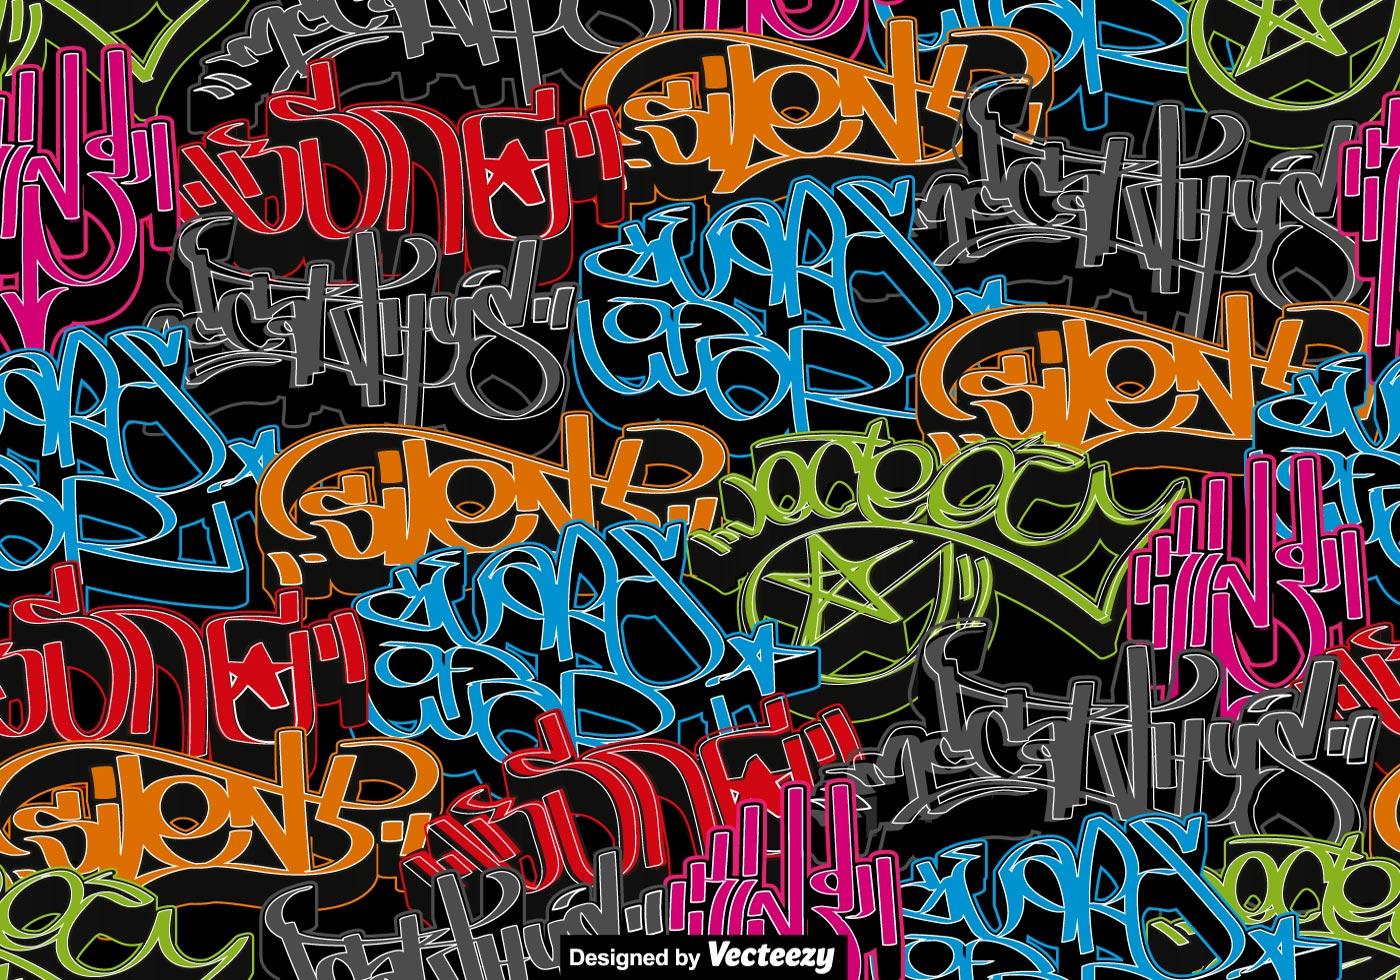 Hand Lettering Alphabet Vintage Wall Art